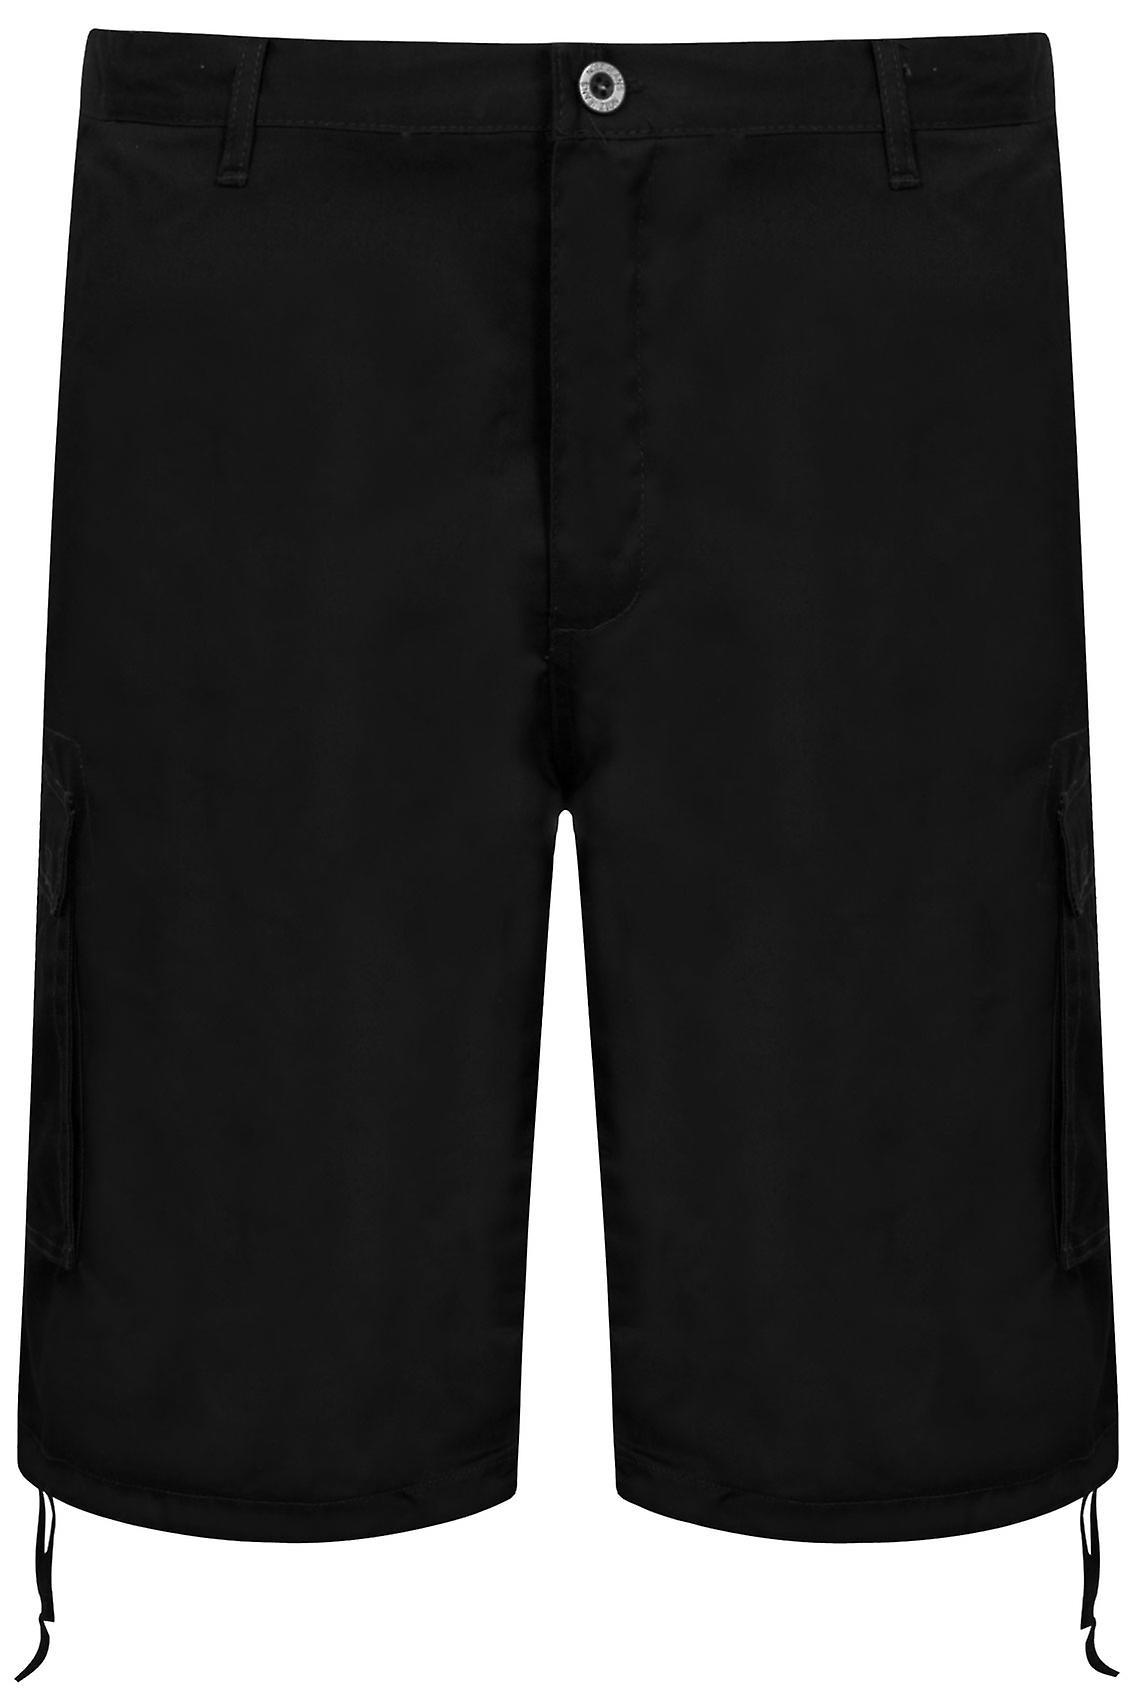 NOIZ Black Cotton Cargo Shorts With Pockets